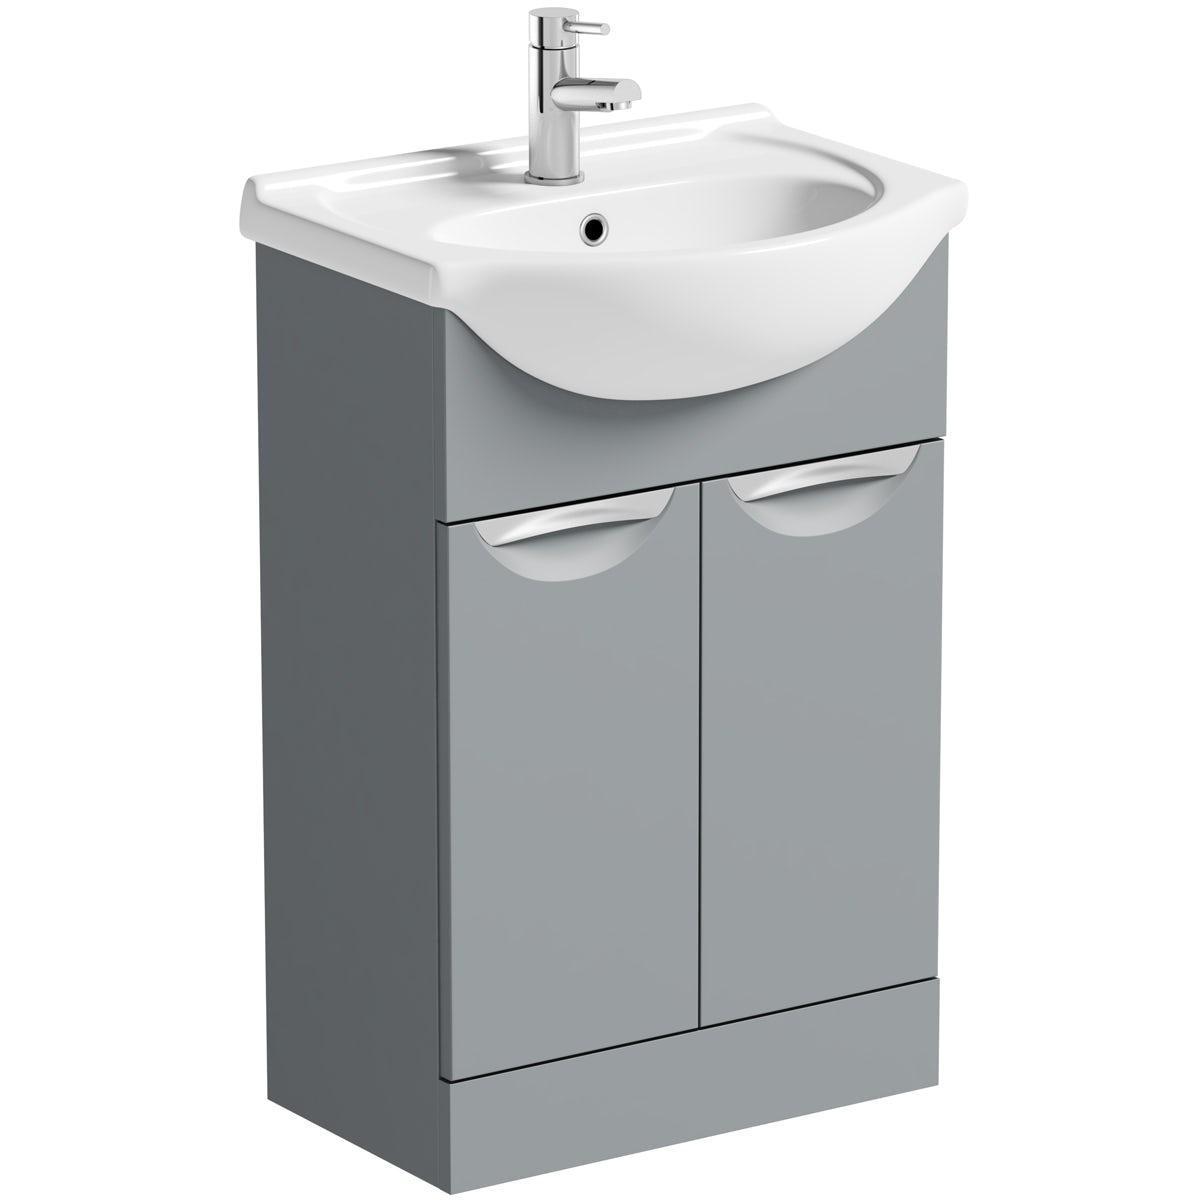 Orchard Elsdon stone grey vanity unit and basin 550mm